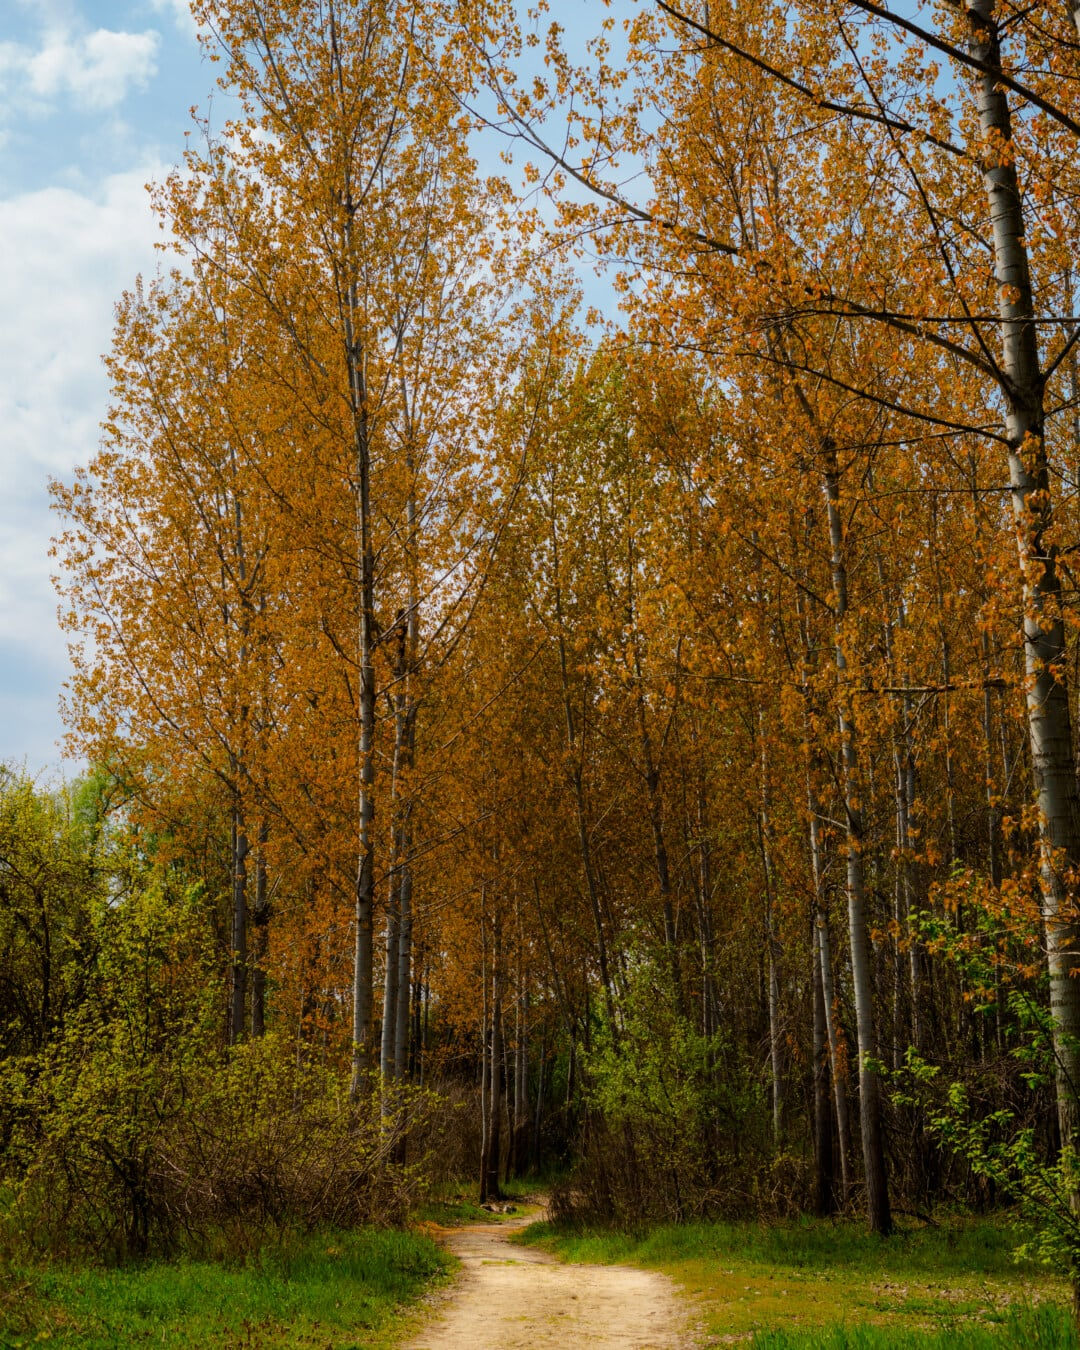 trees, forest path, autumn season, forest, poplar, wood, landscape, autumn, birch, tree